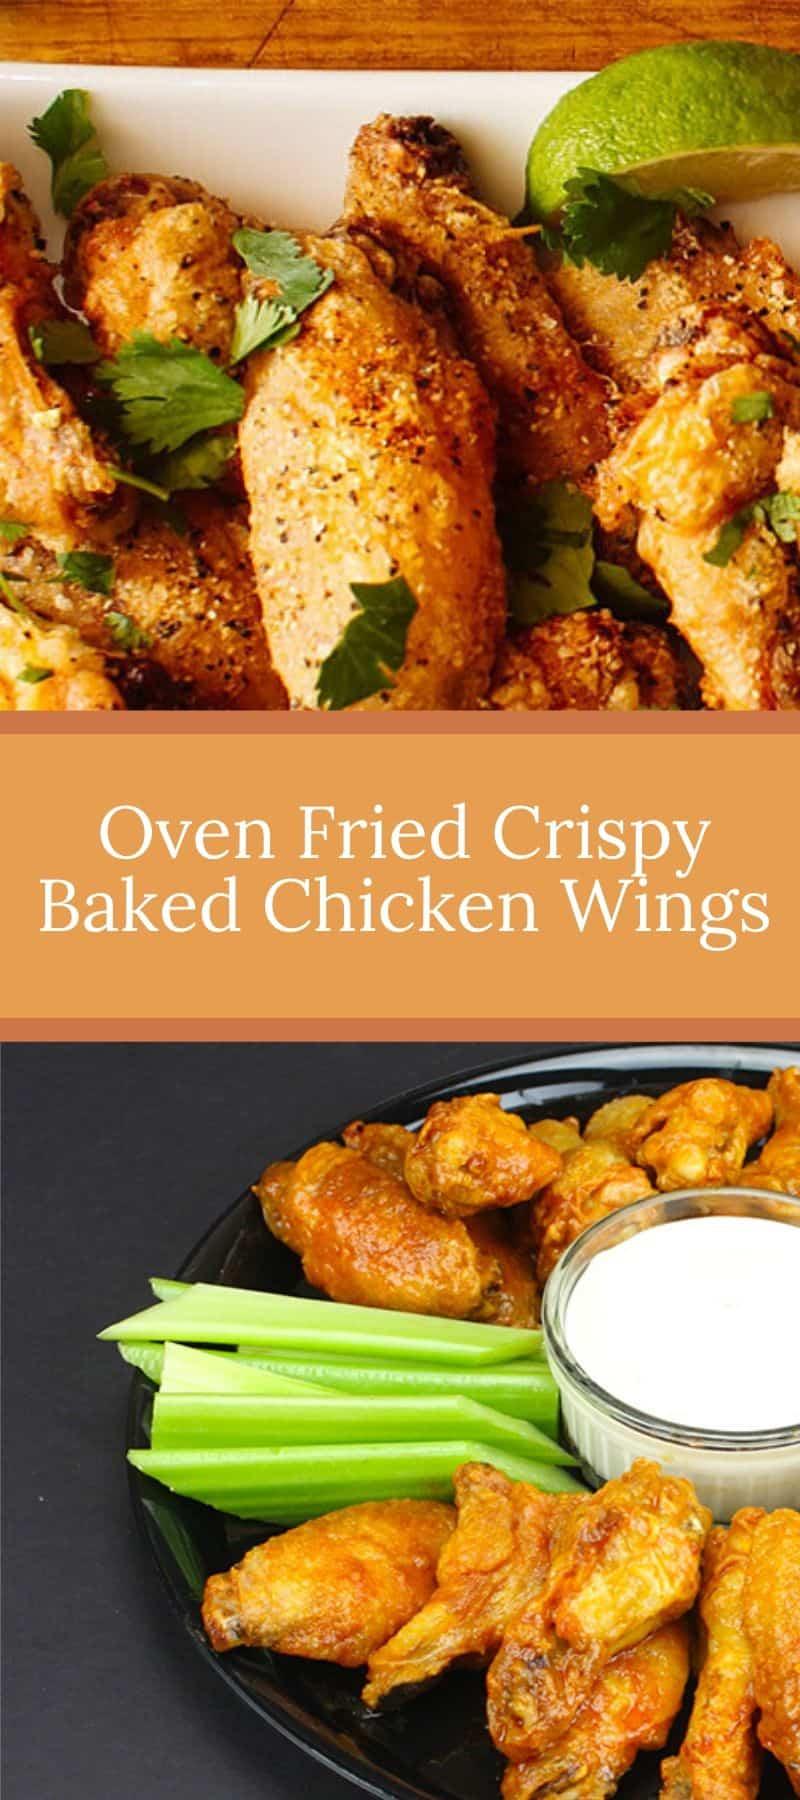 Oven Fried Crispy Baked Chicken Wings 3